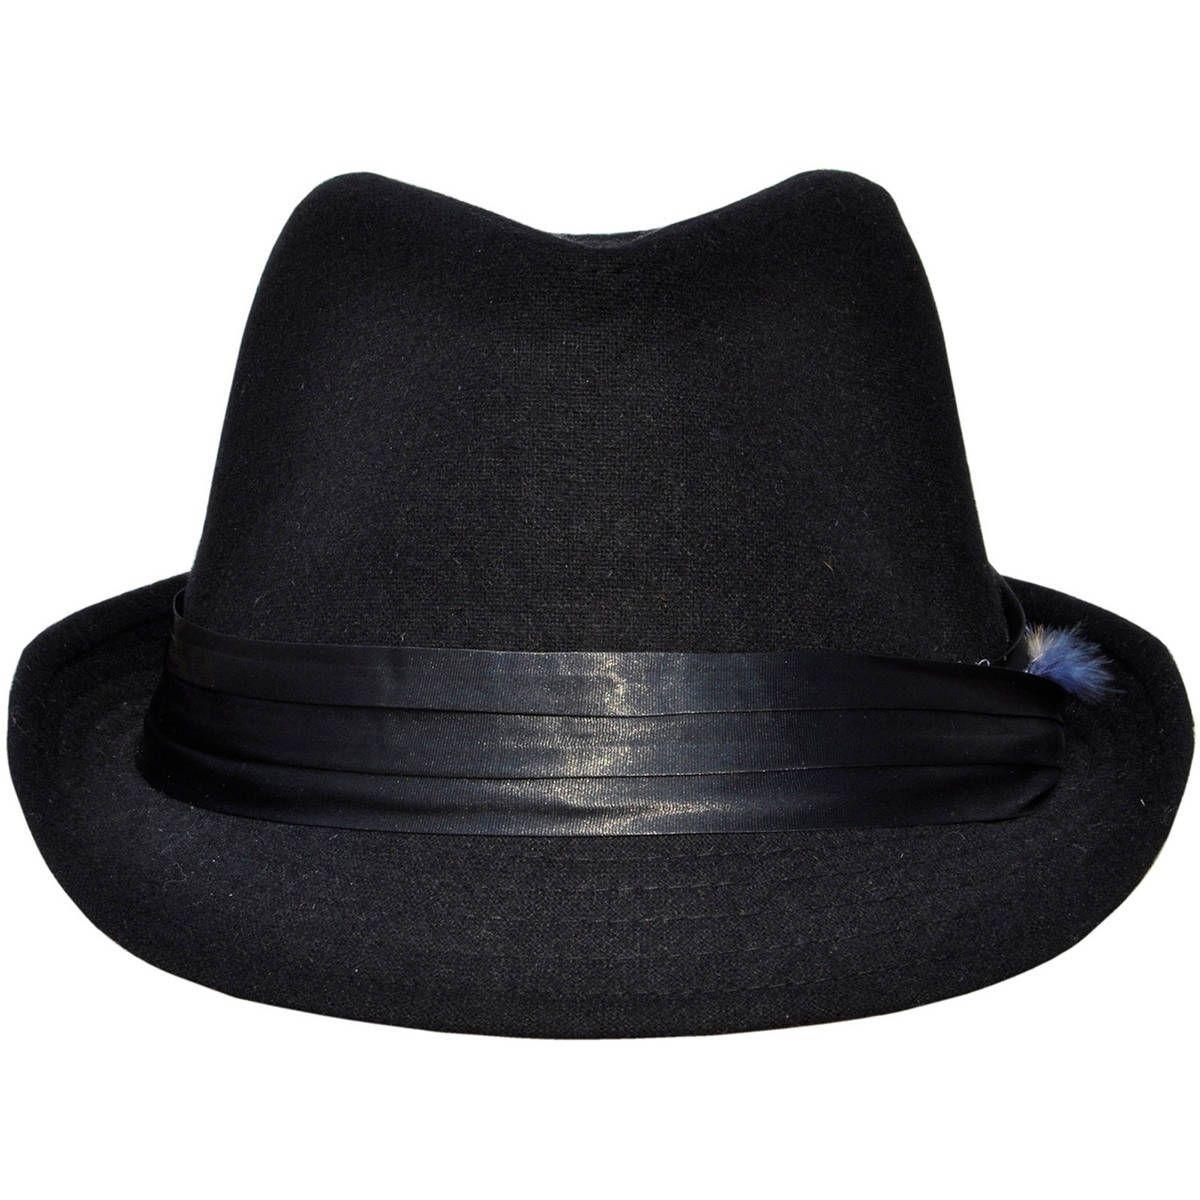 2f8641cc4f6d6d Simplicity Unisex Teardrop-Dent Pinstriped Short Brim Fedora Cap  (black/orange fur), Size 4 inches, Front Brim: 1